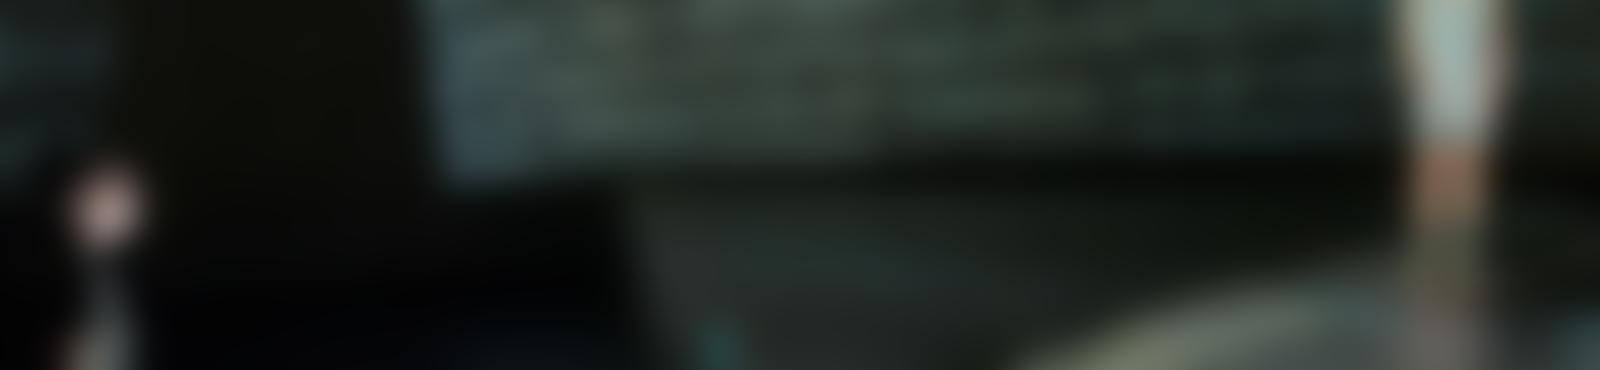 Blurred a8dffe80 4536 44ac a81f 46b936395493